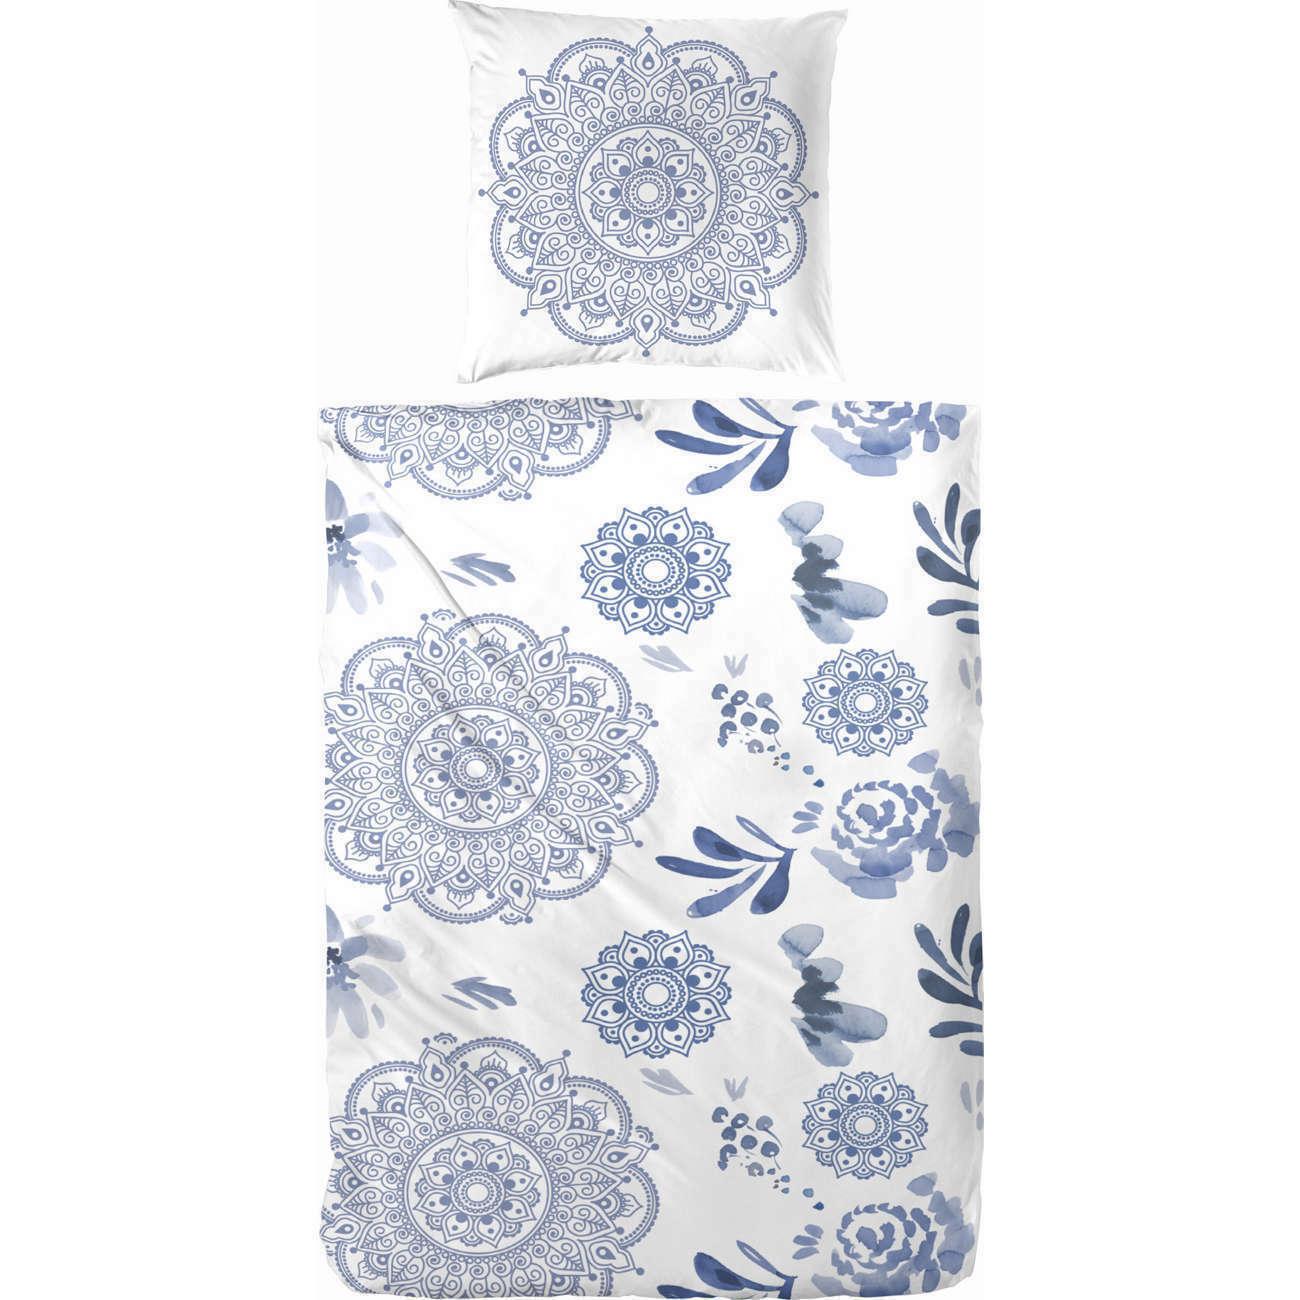 Primera Bettwäsche 123064-003 Mandala Blaumen Blüten Weiß Blau Blau Blau 155x220 | Helle Farben  9b637f